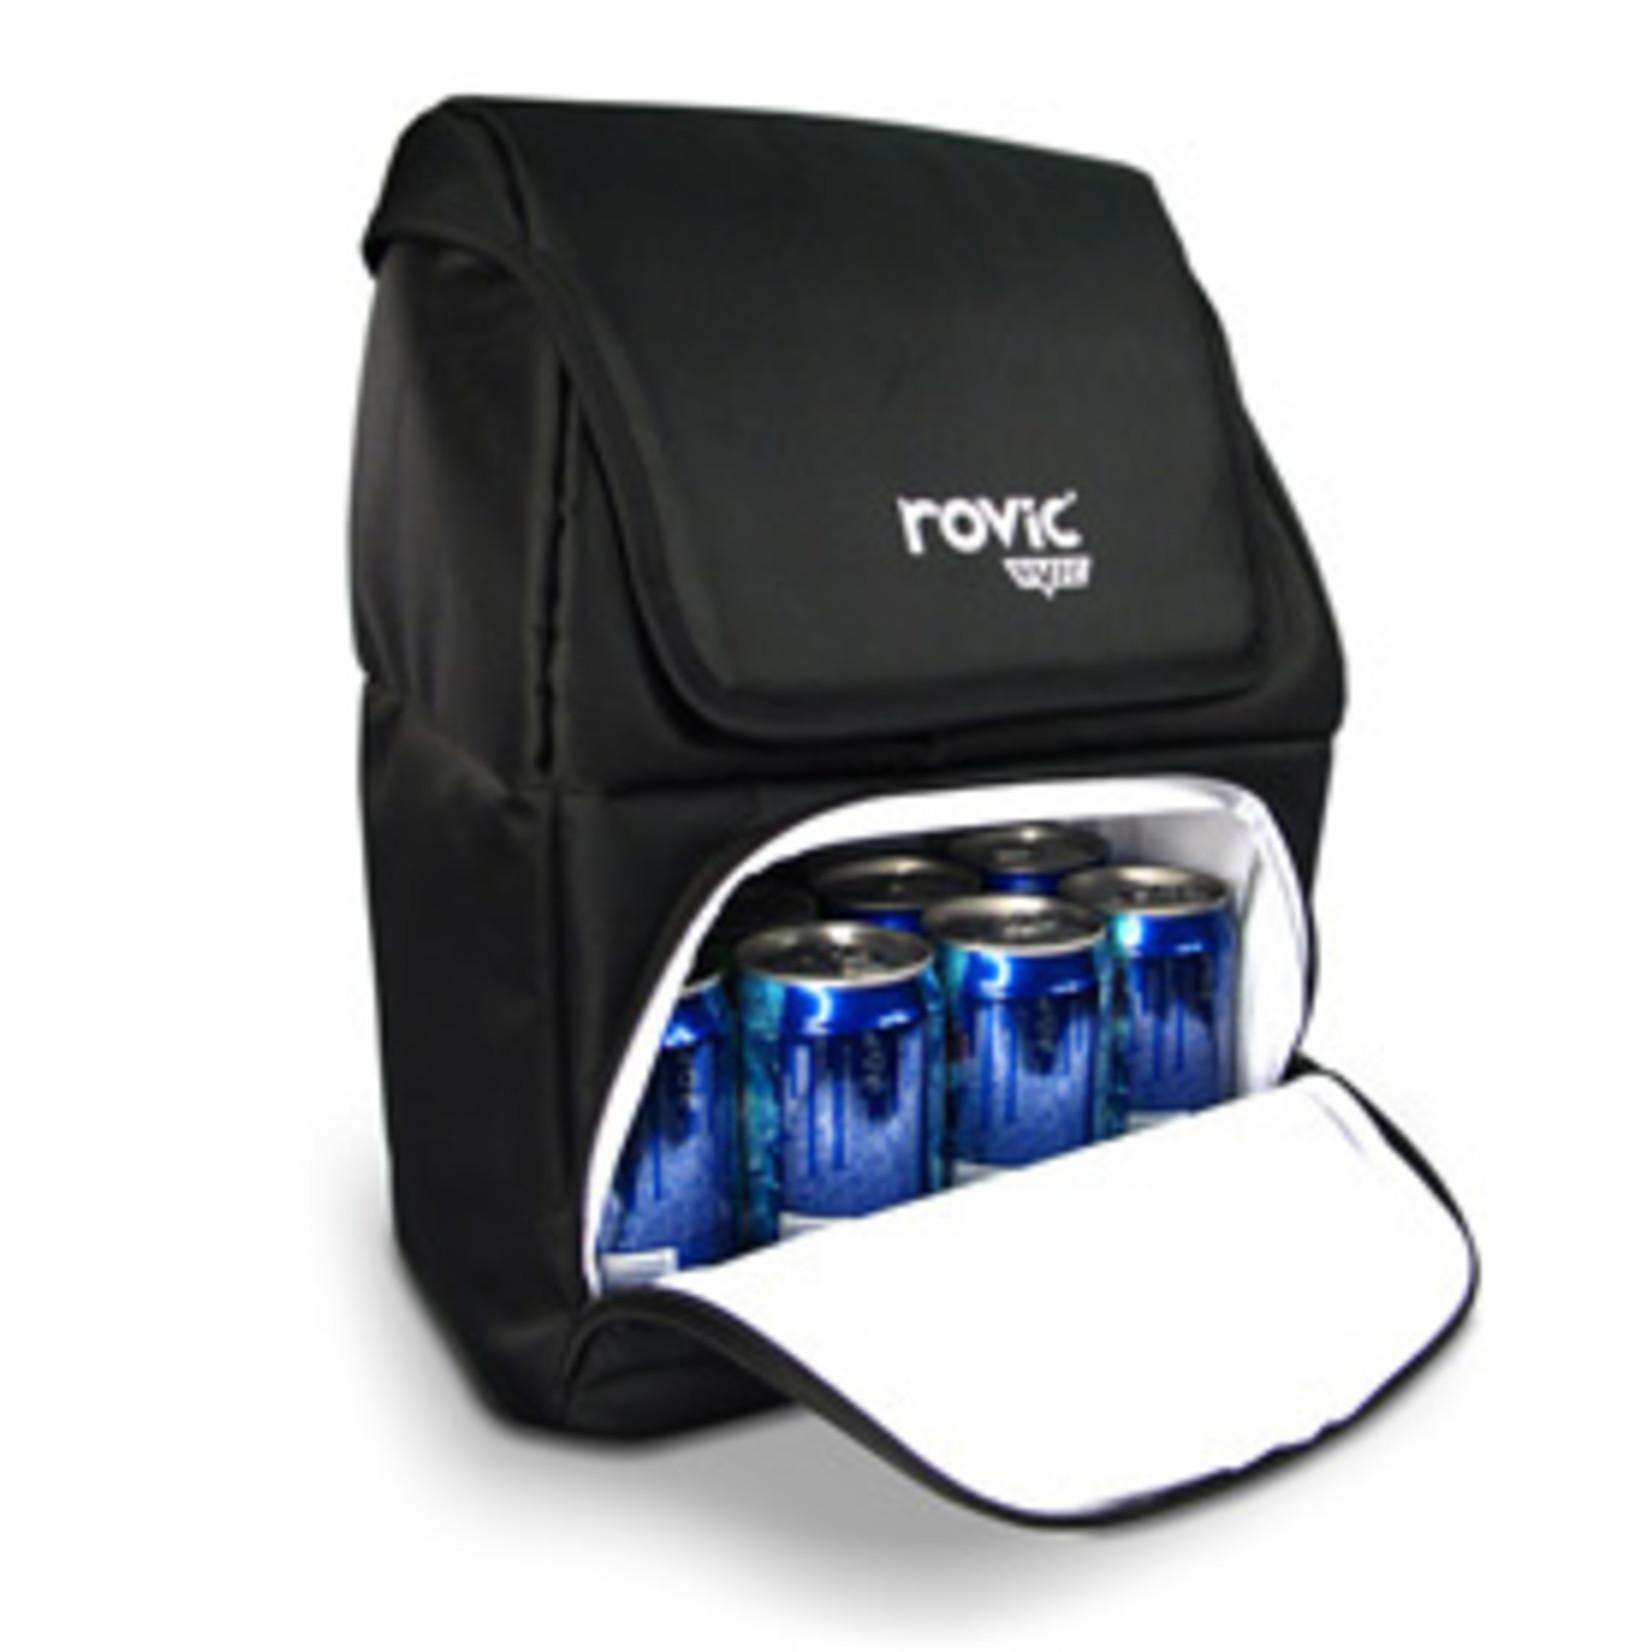 Rovic Rovic Cooler Bag Black RV1C-14